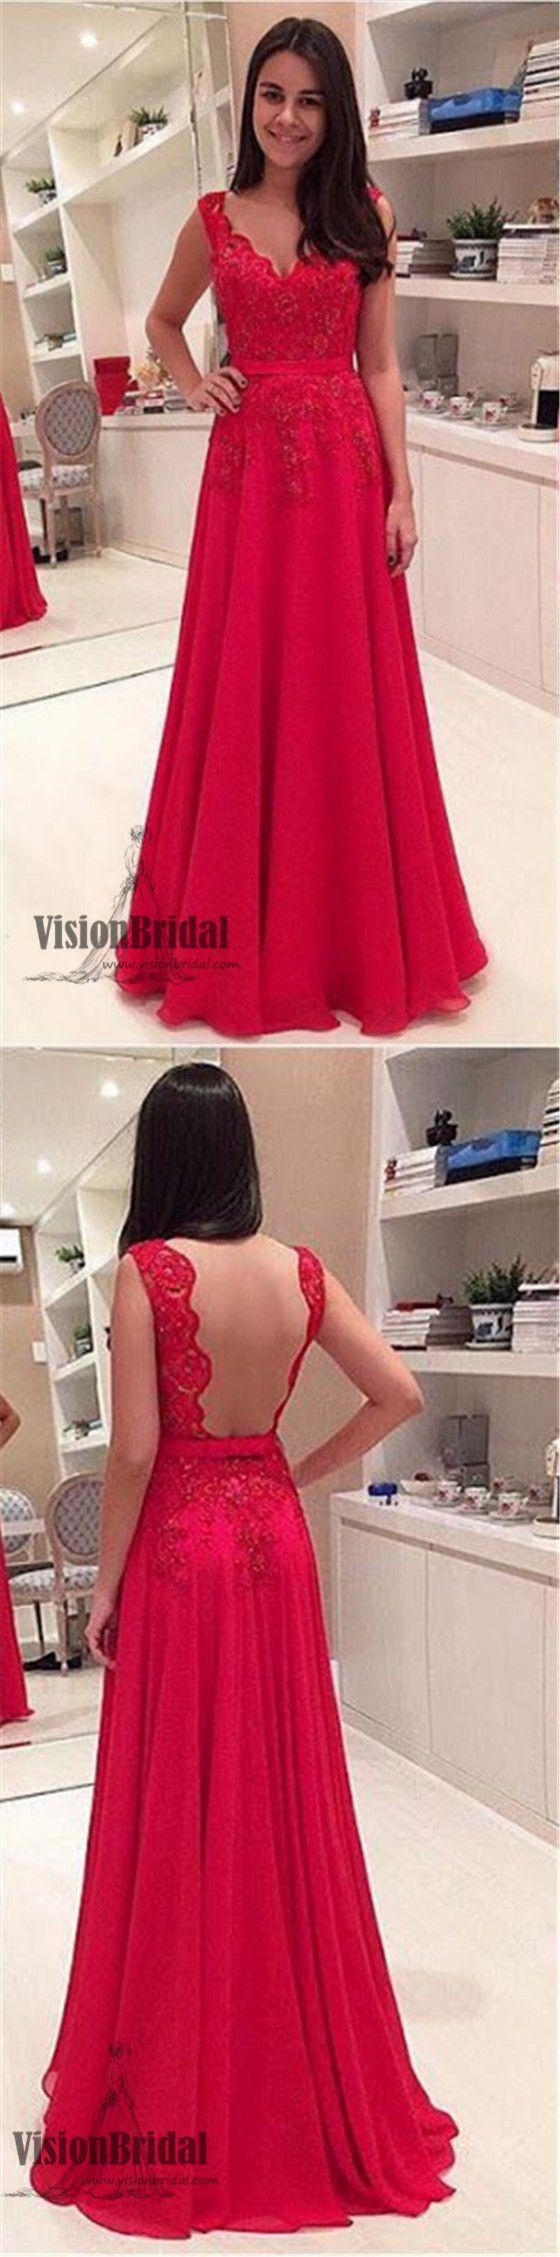 Red Lace Rhinestone Open Back Prom Dress, A-Line Chiffon Floor Length Prom Dress, Prom Dresses, VB0216 #promdress